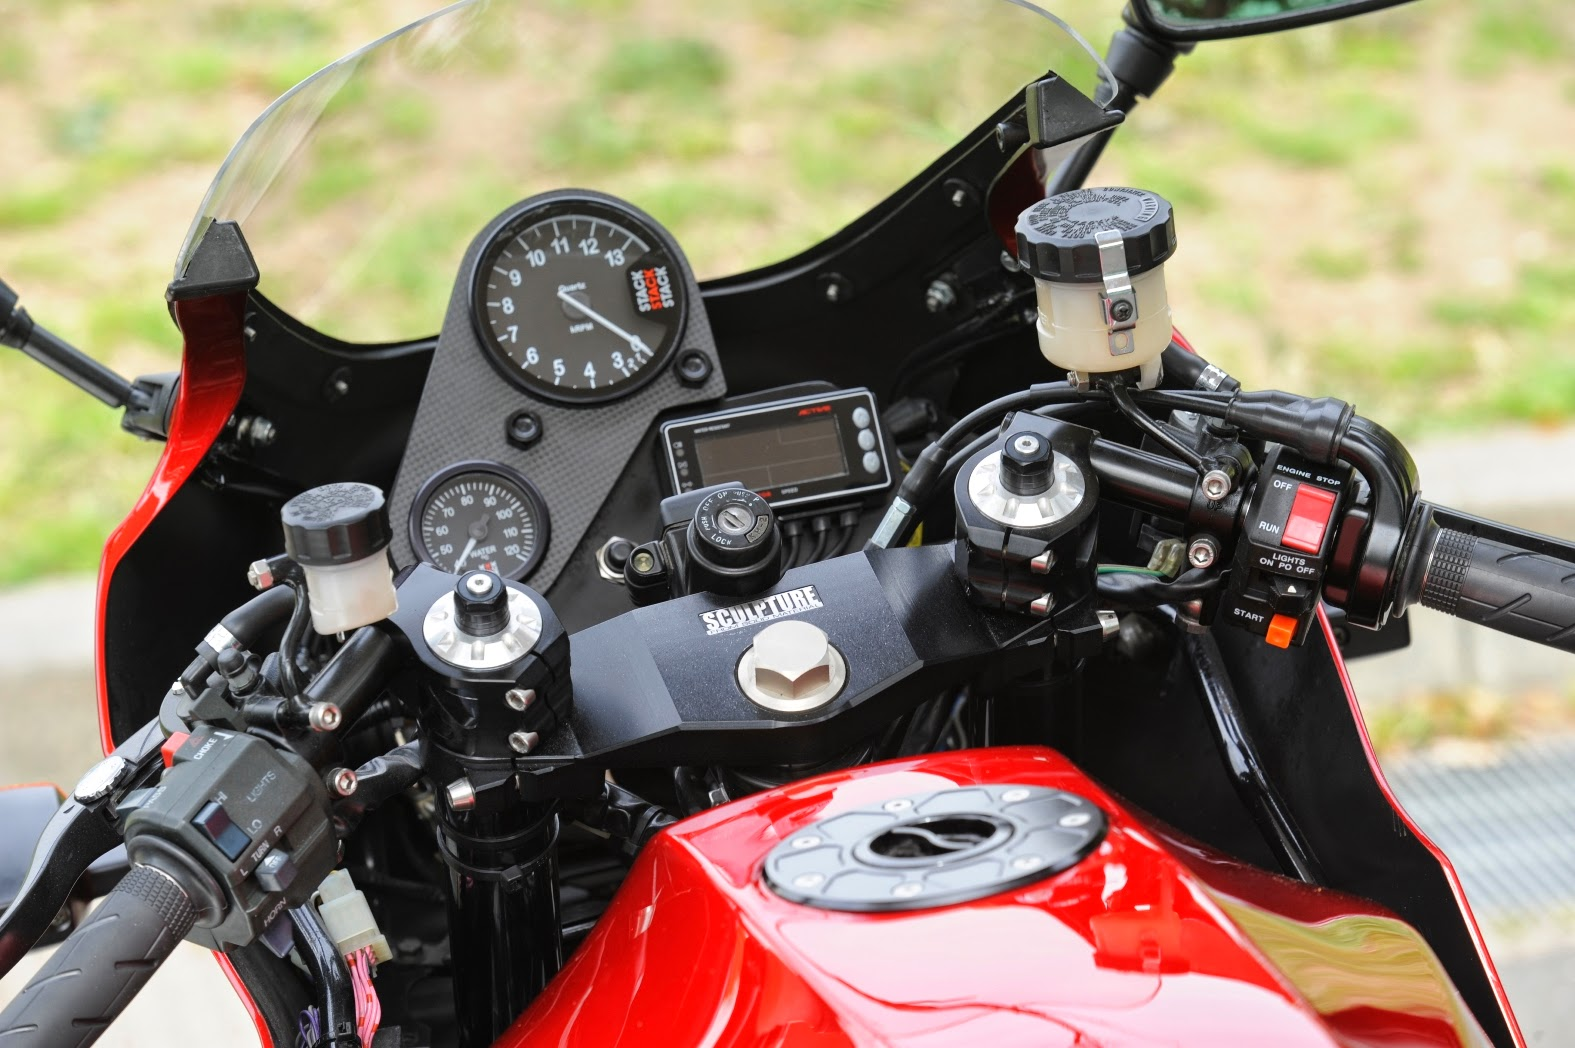 Racing Cafè: Kawasaki GPZ 900 R RCM-116 Sport Package Type